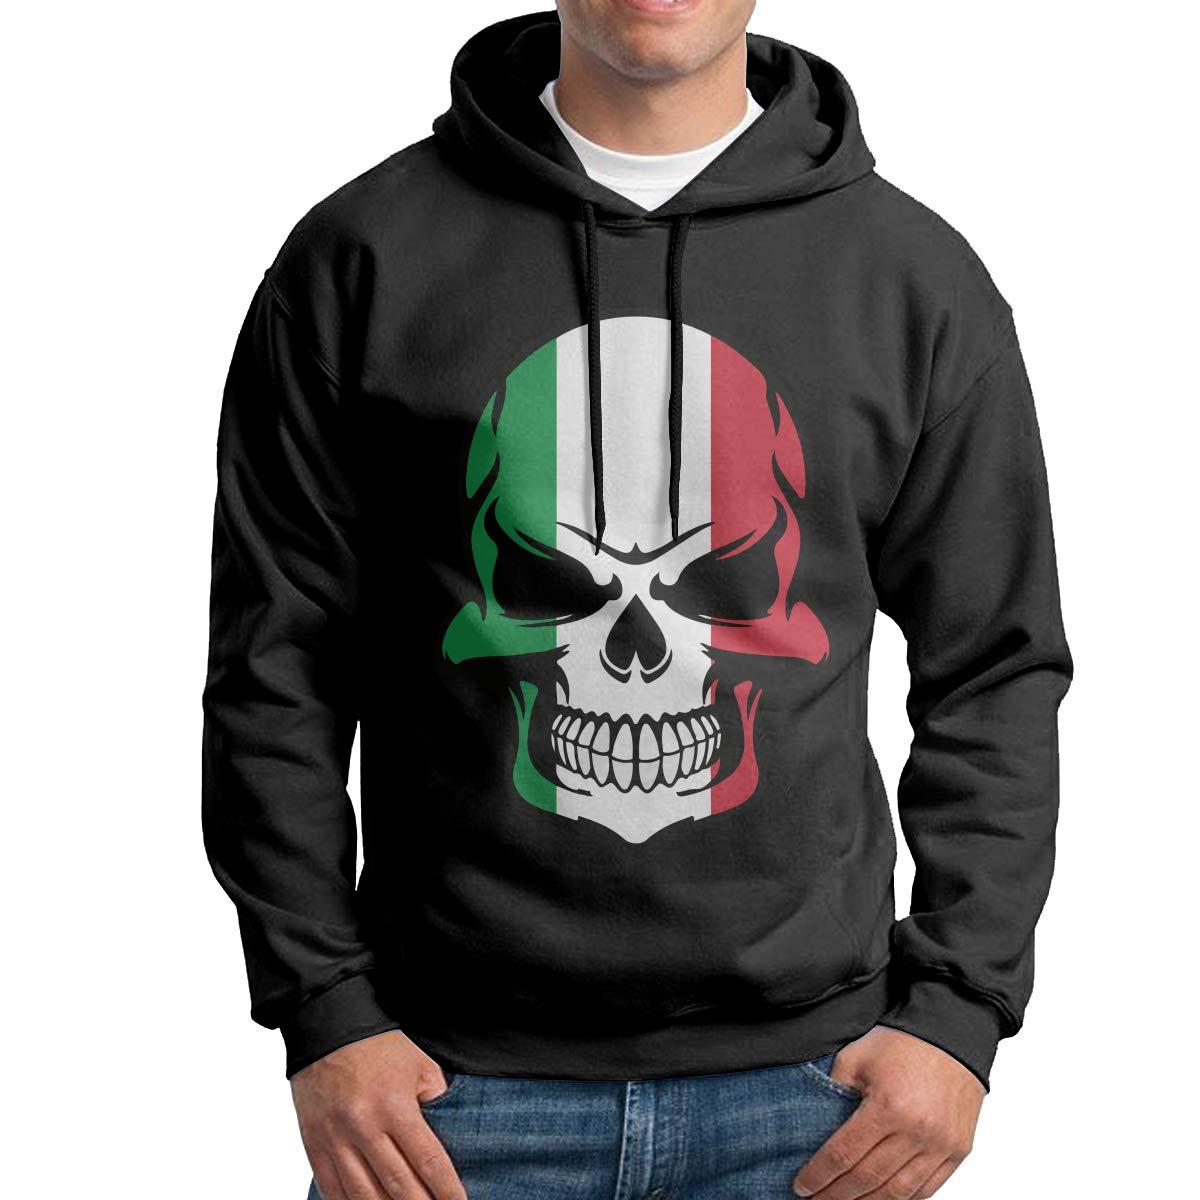 Boys Italian Flag Skull Patterns Print Athletic Pullover Tops Fashion Sweatshirts